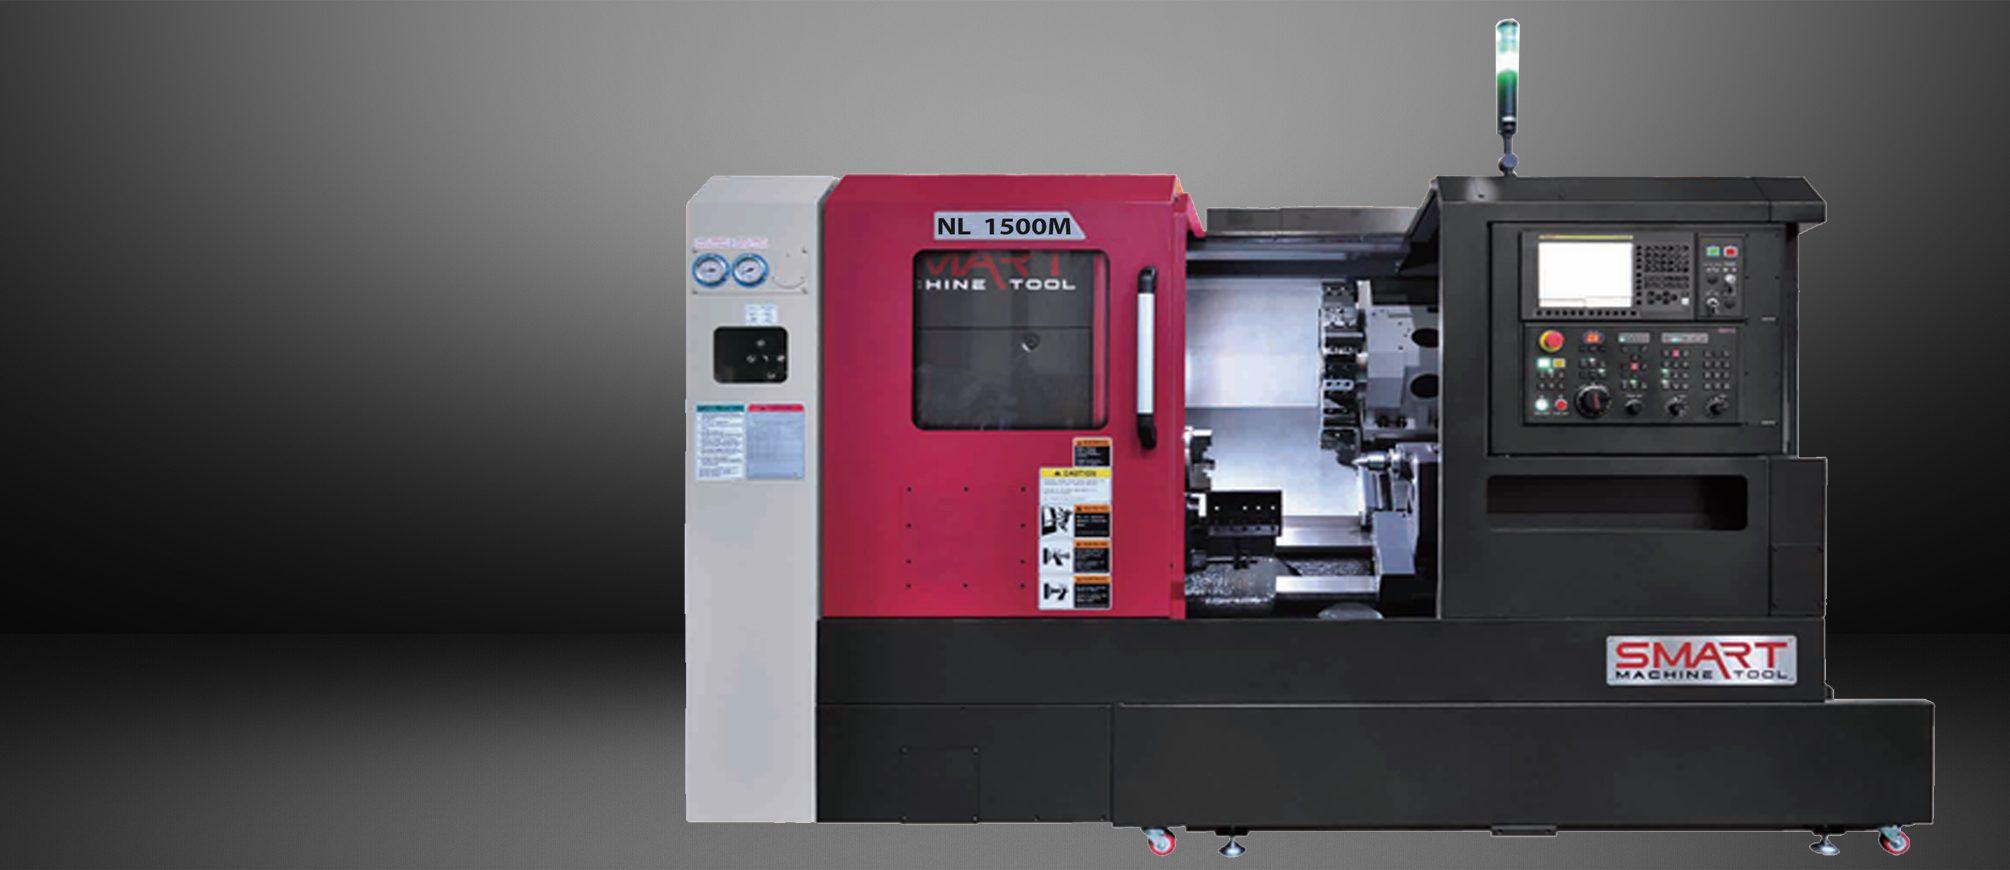 SMART NL 1500M – BOX WAY – (6″ CHUCK) 3-Axis CNC Lathes